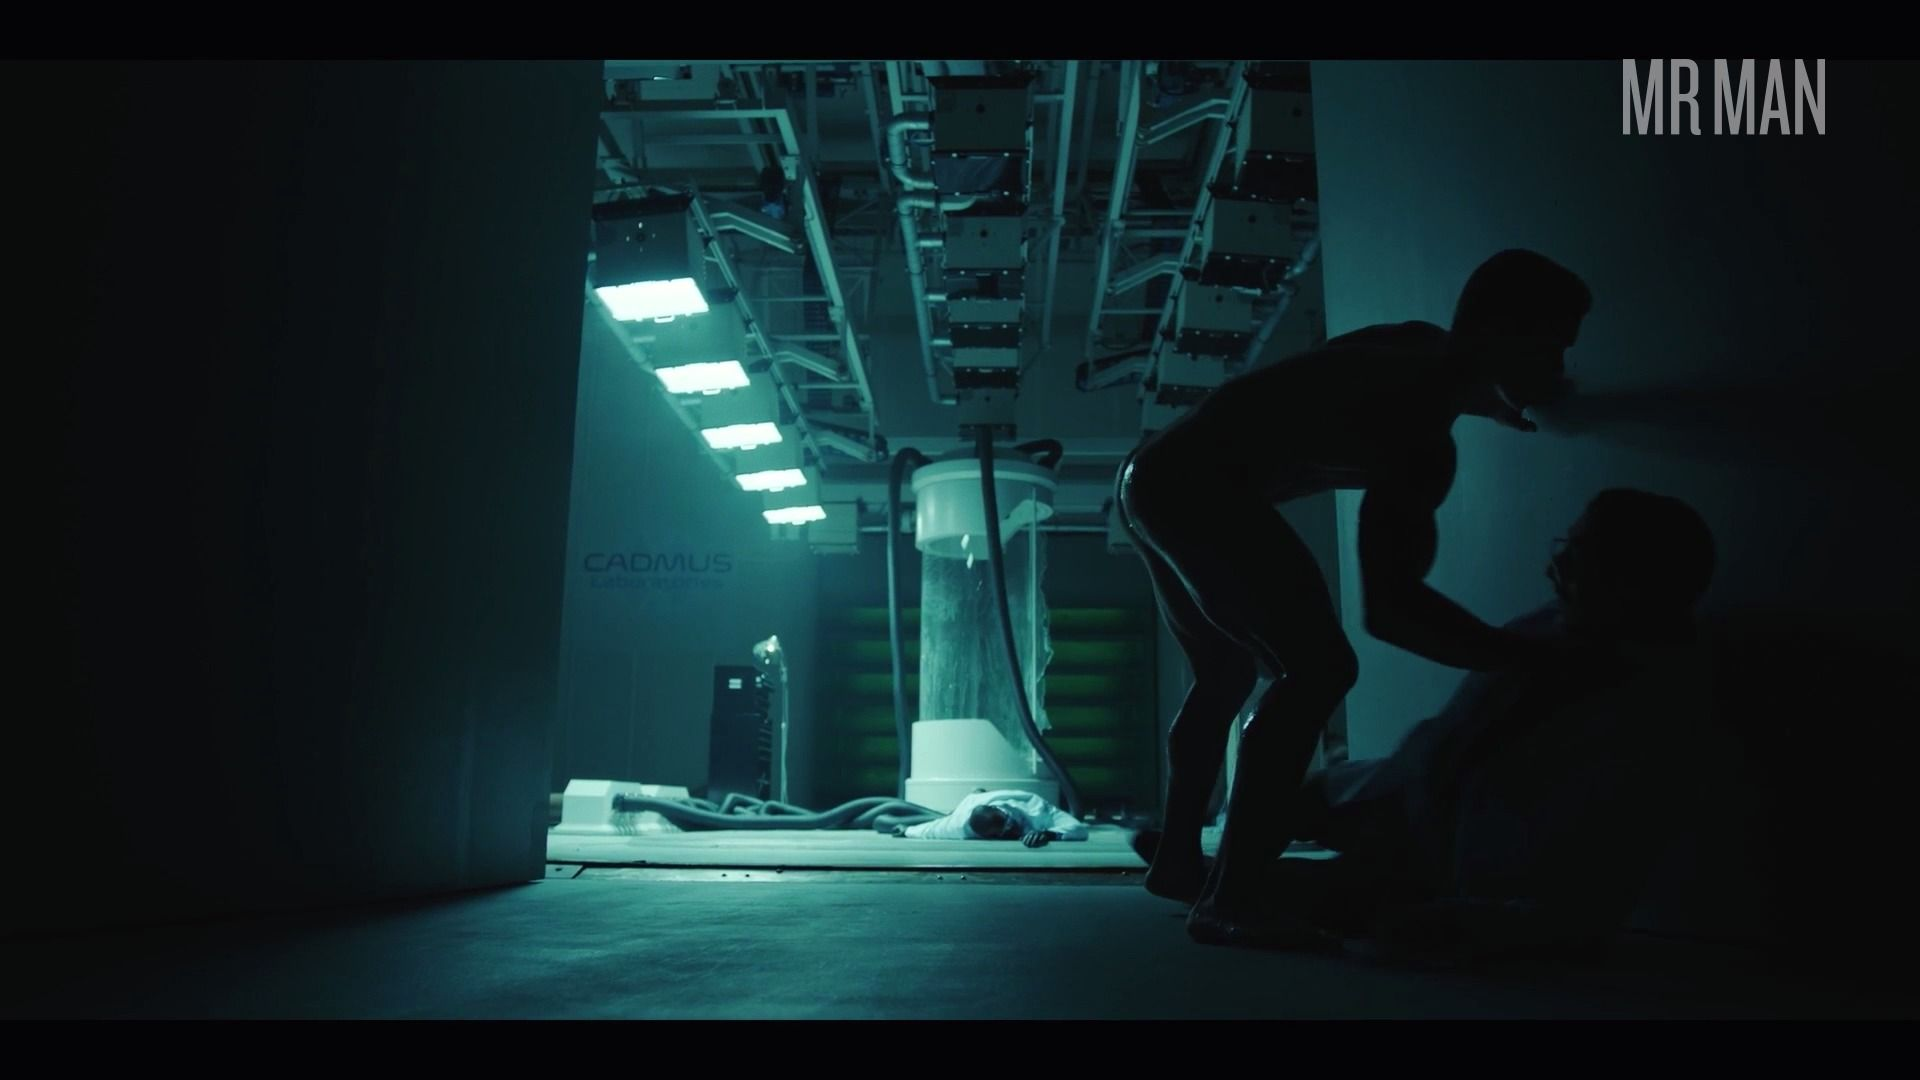 Titans 1x11 muir hd 01 frame 3 override